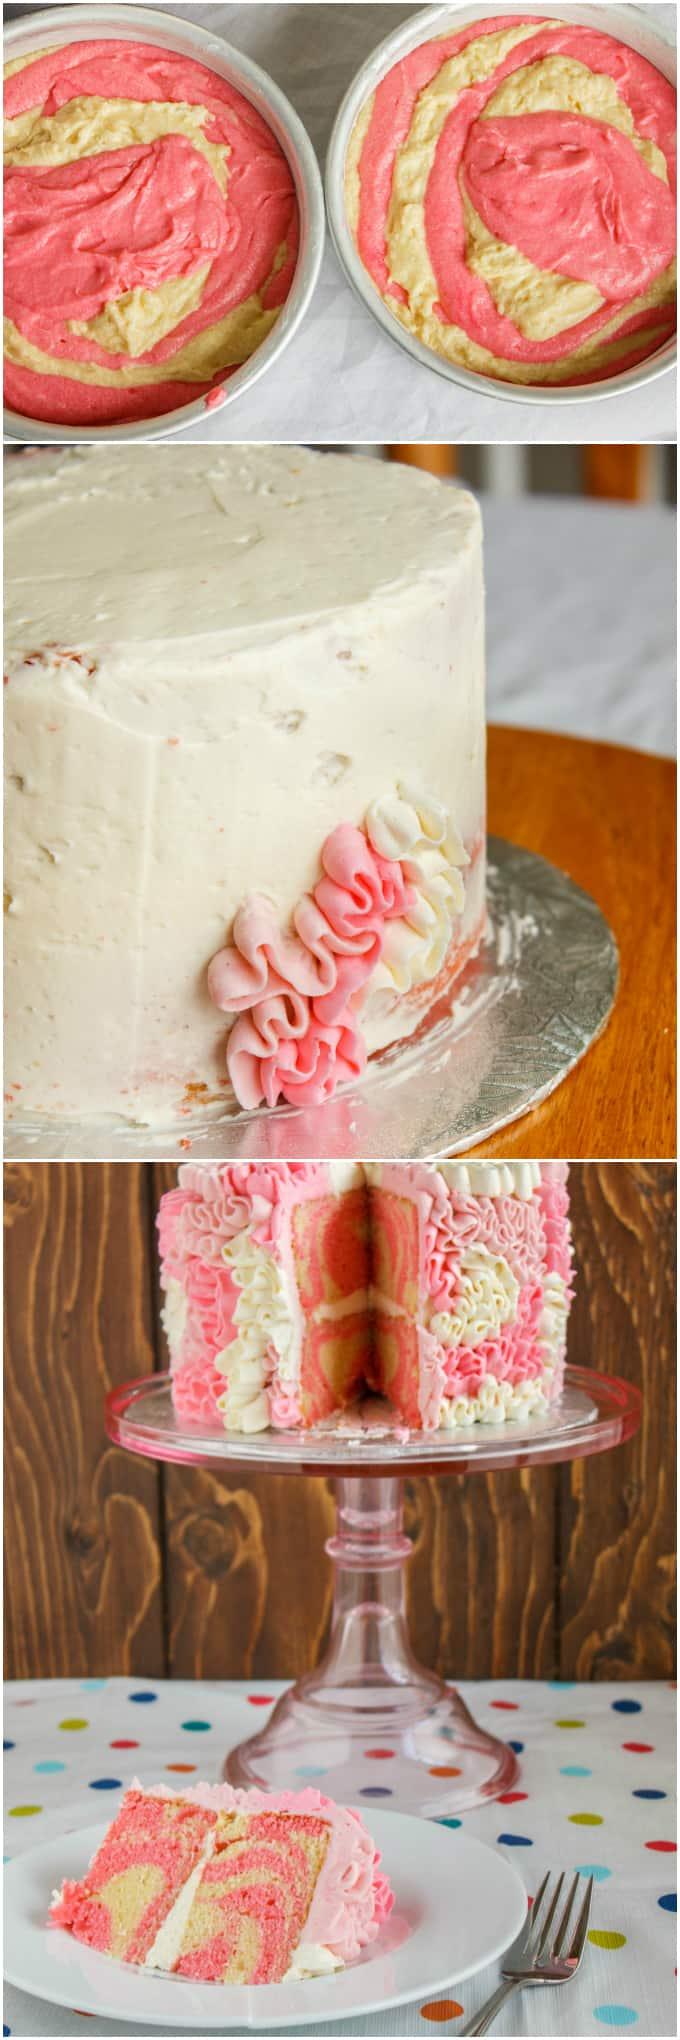 Zebra Cake with Messy Ruffles 4